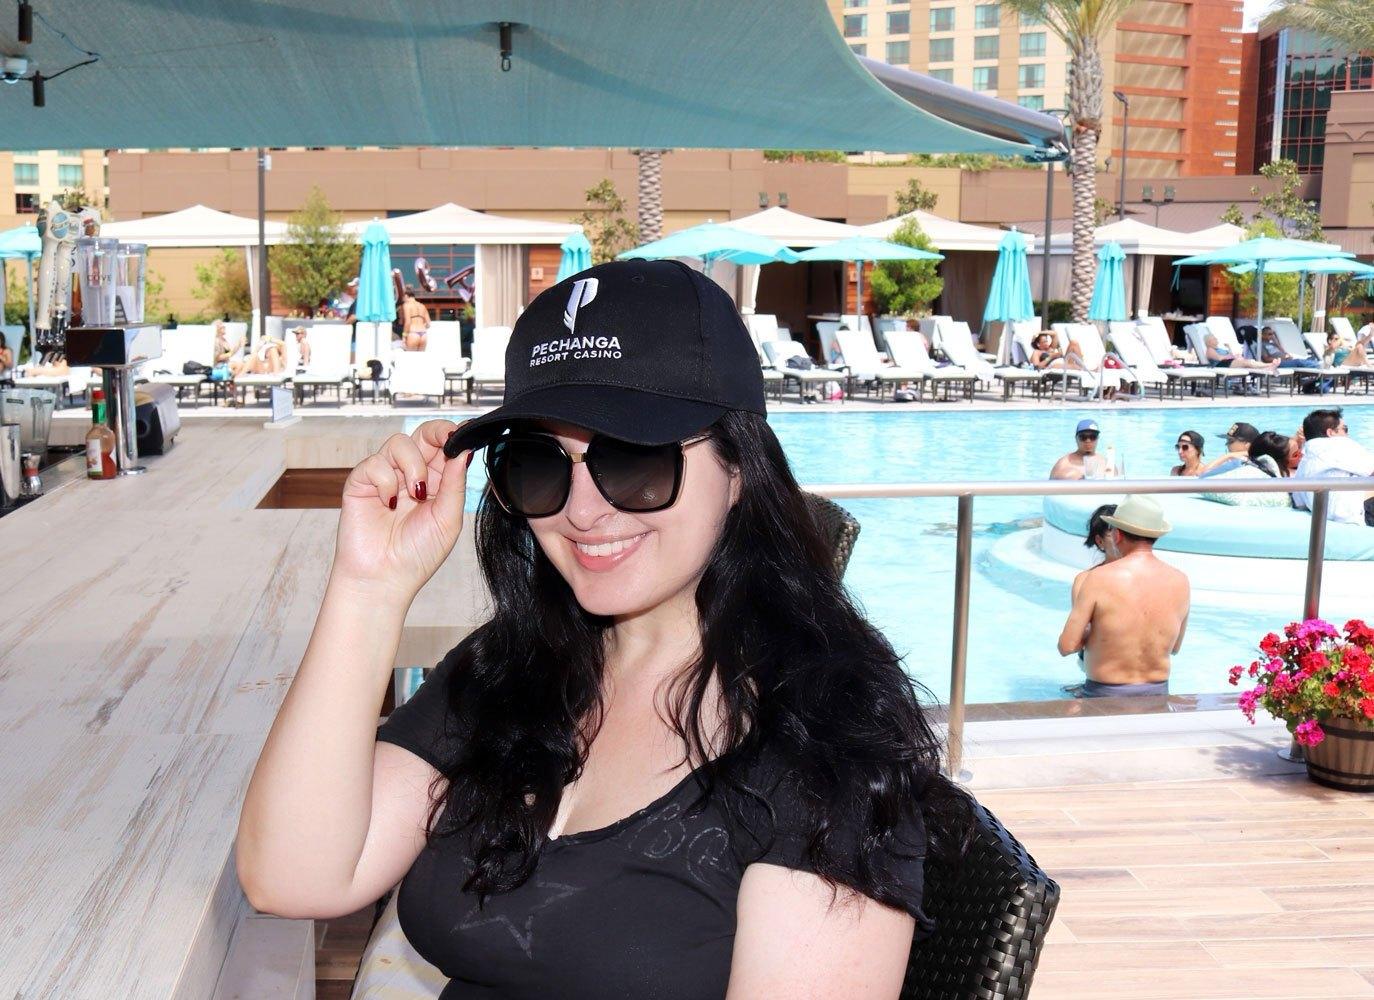 Travel-Blogger-My-Beauty-Bunny-at-Pechanga-Resort-Casino-Temecula.jpg